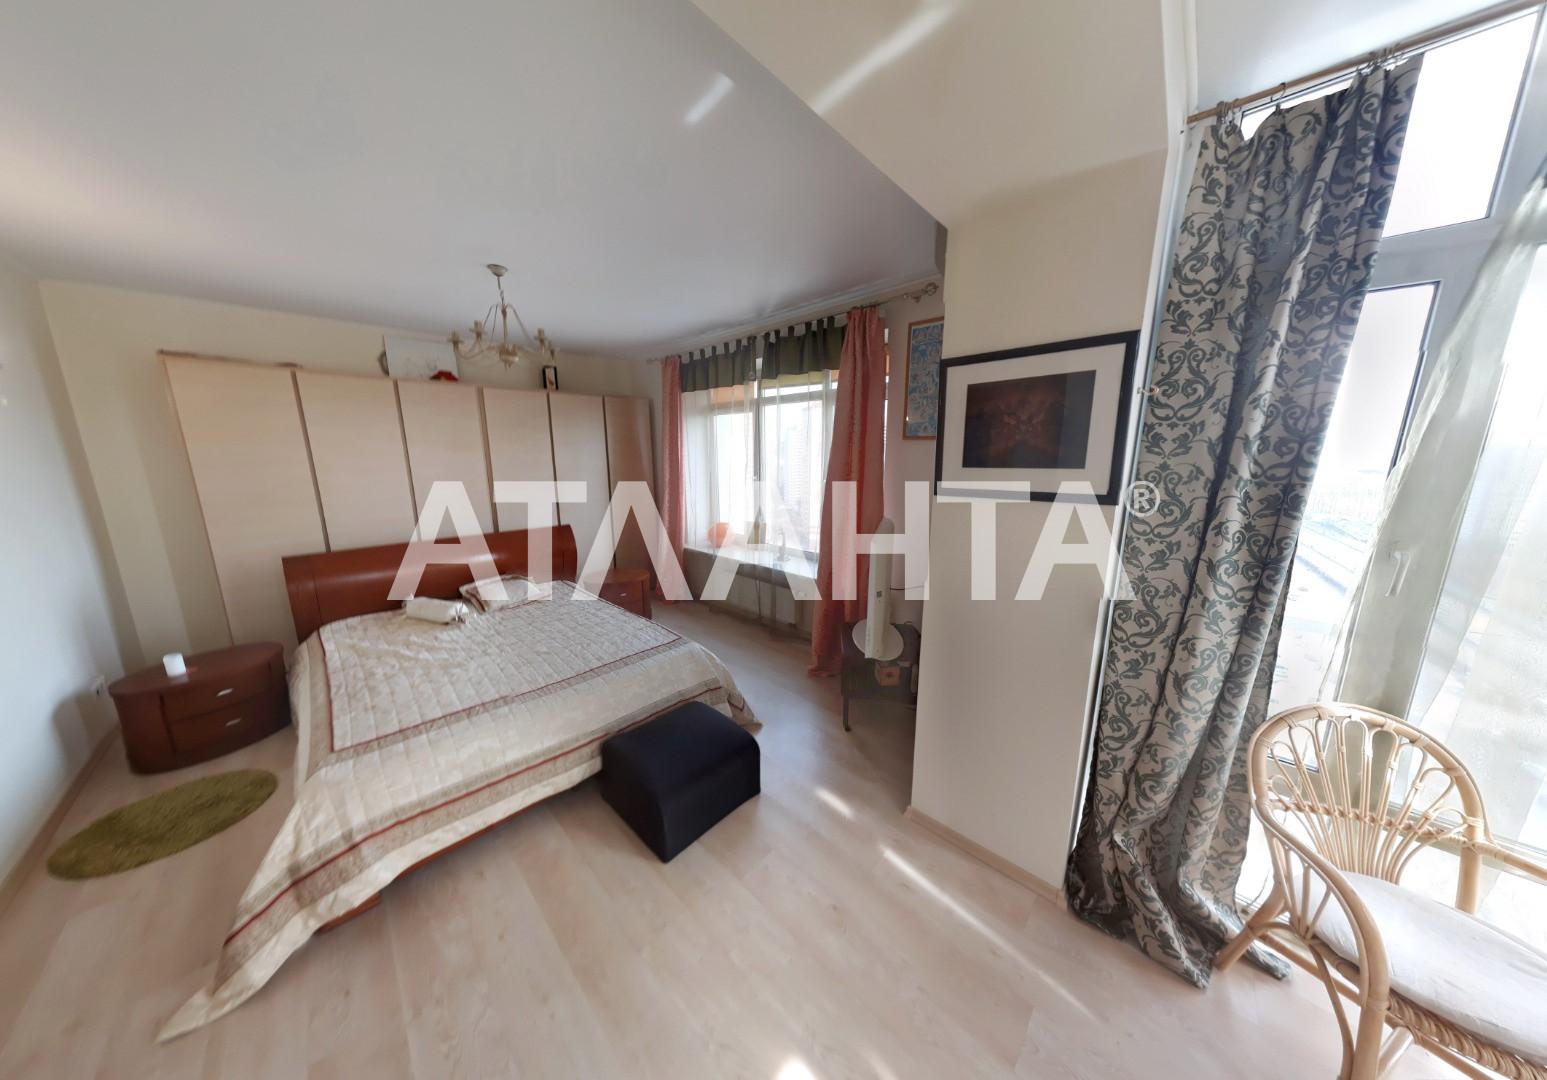 Продается 3-комнатная Квартира на ул. Ломоносова — 118 900 у.е. (фото №21)